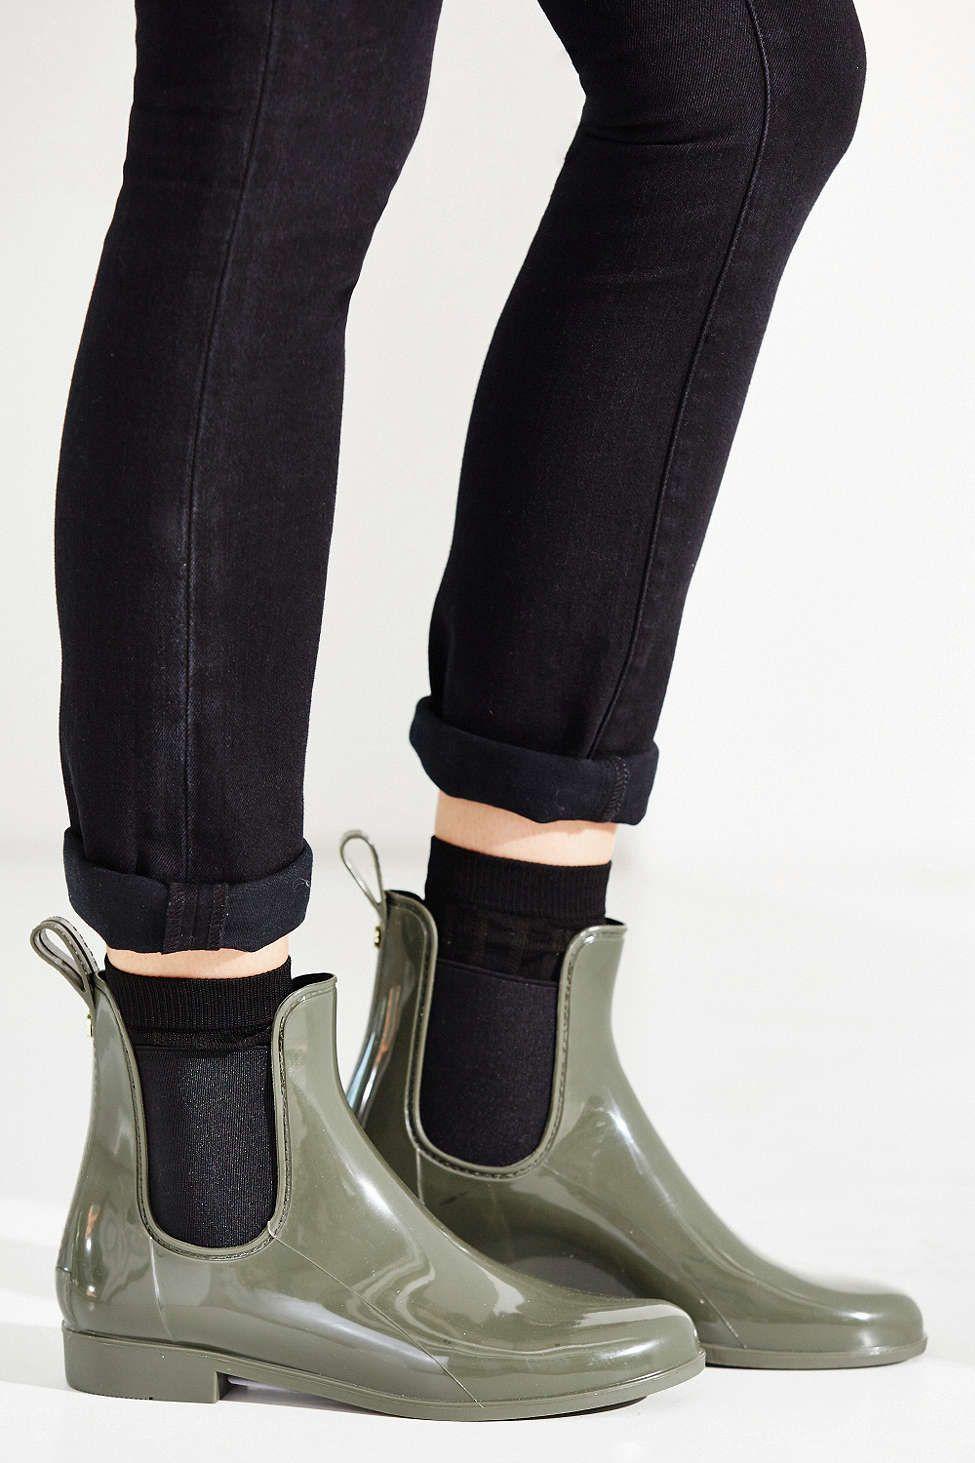 28++ Sam edelman rain boots ideas information